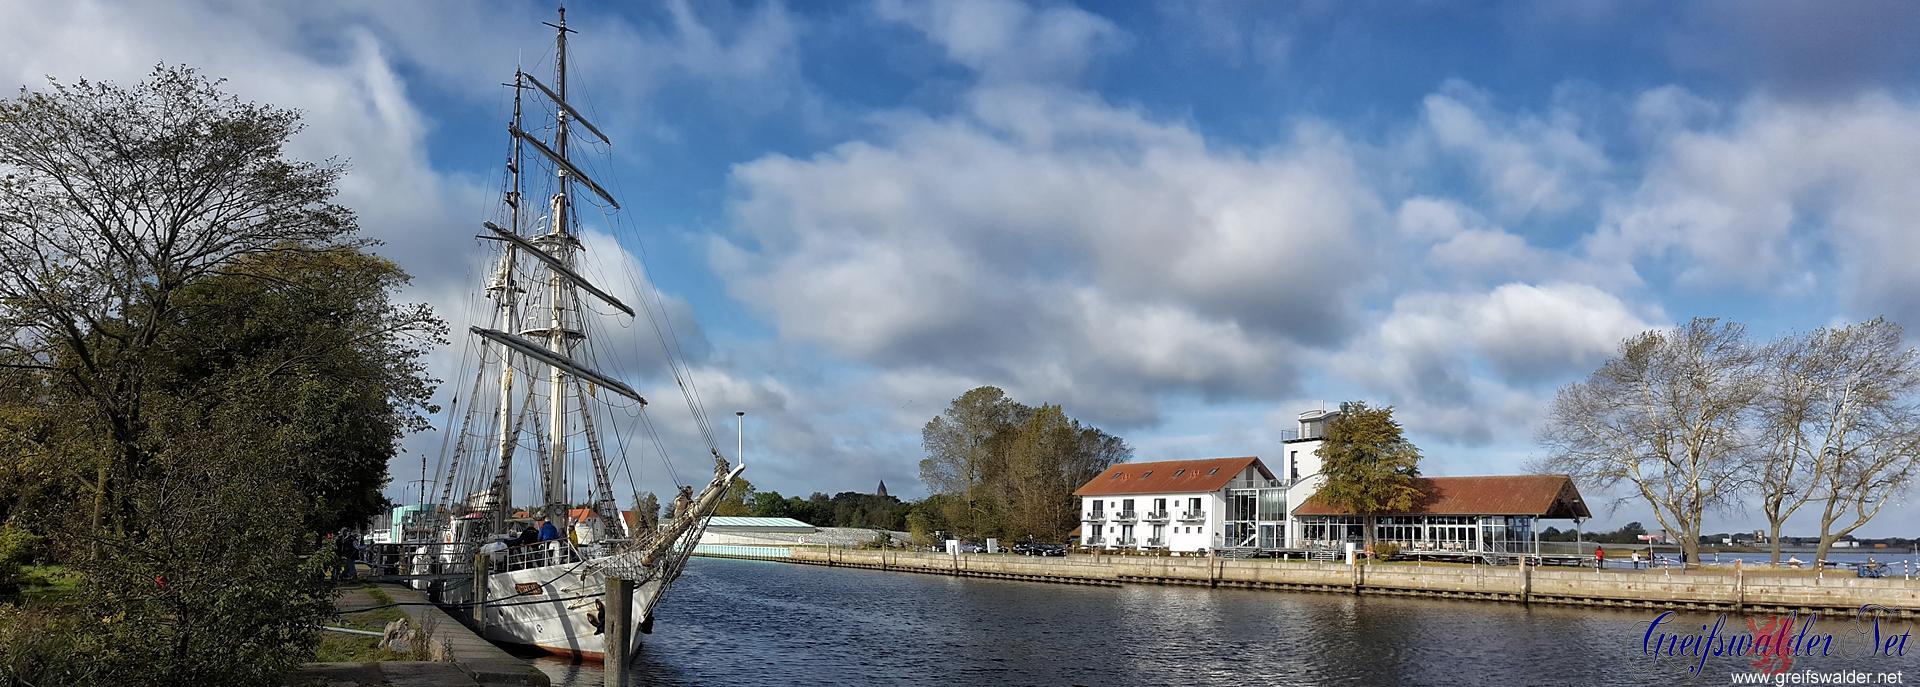 "Segelschulschiff ""Greif"" in Greifswald-Wieck"